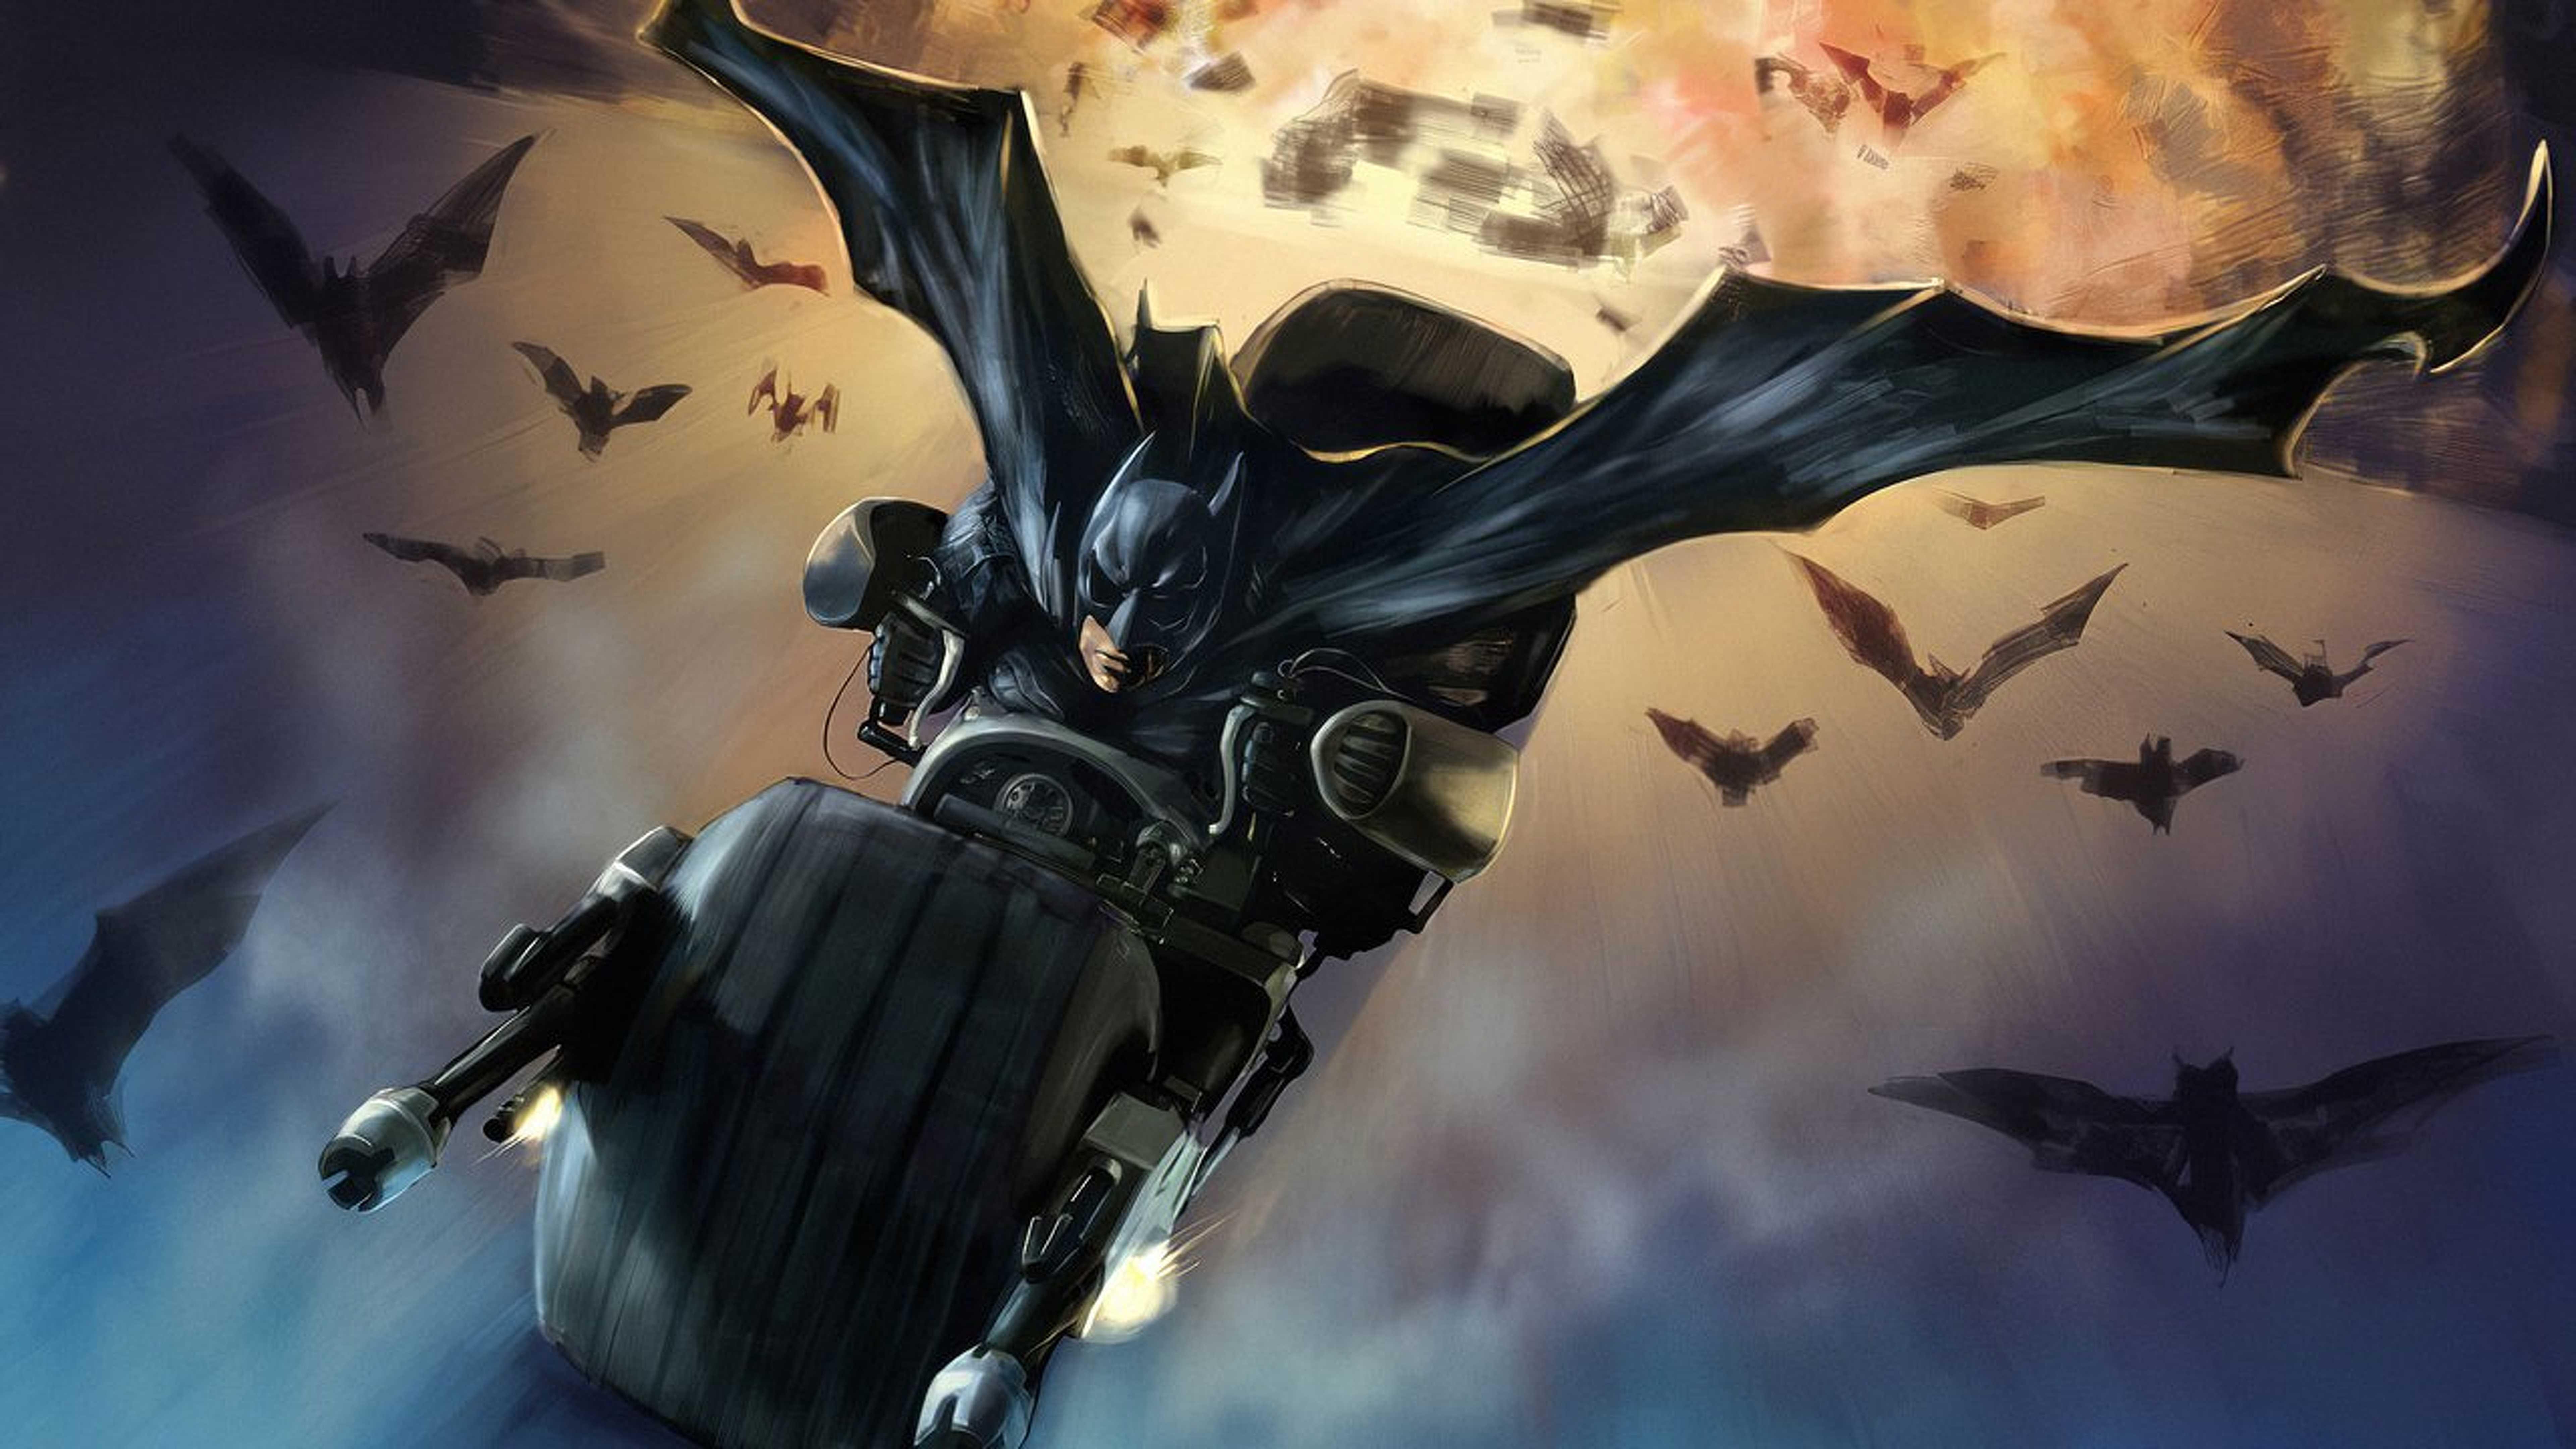 Batman Bat Mobile, Batman, Hd, Superheroes, Digital , HD Wallpaper & Backgrounds